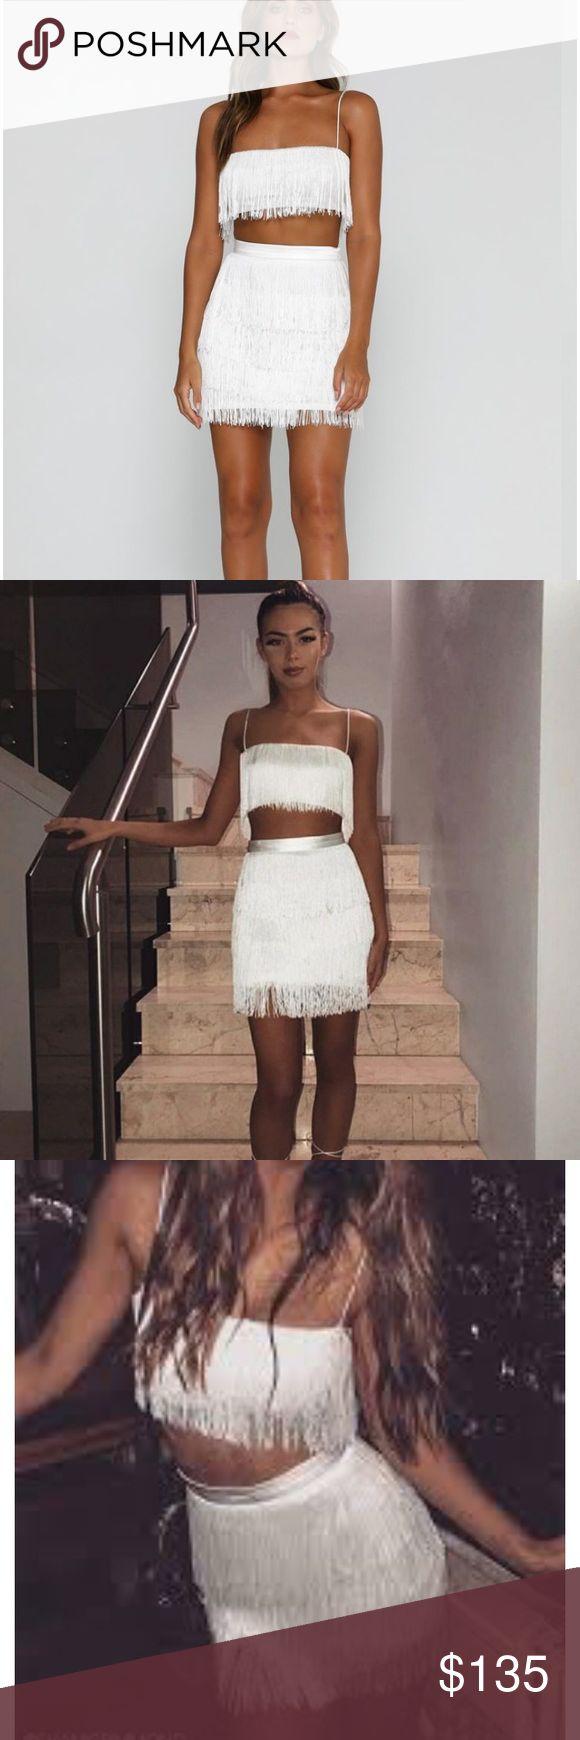 cd9fcf690a2bf Meshki Sofia Fringe Crop Top   Skirt Gorgeous Meshki set ! Brand New with  Tags .